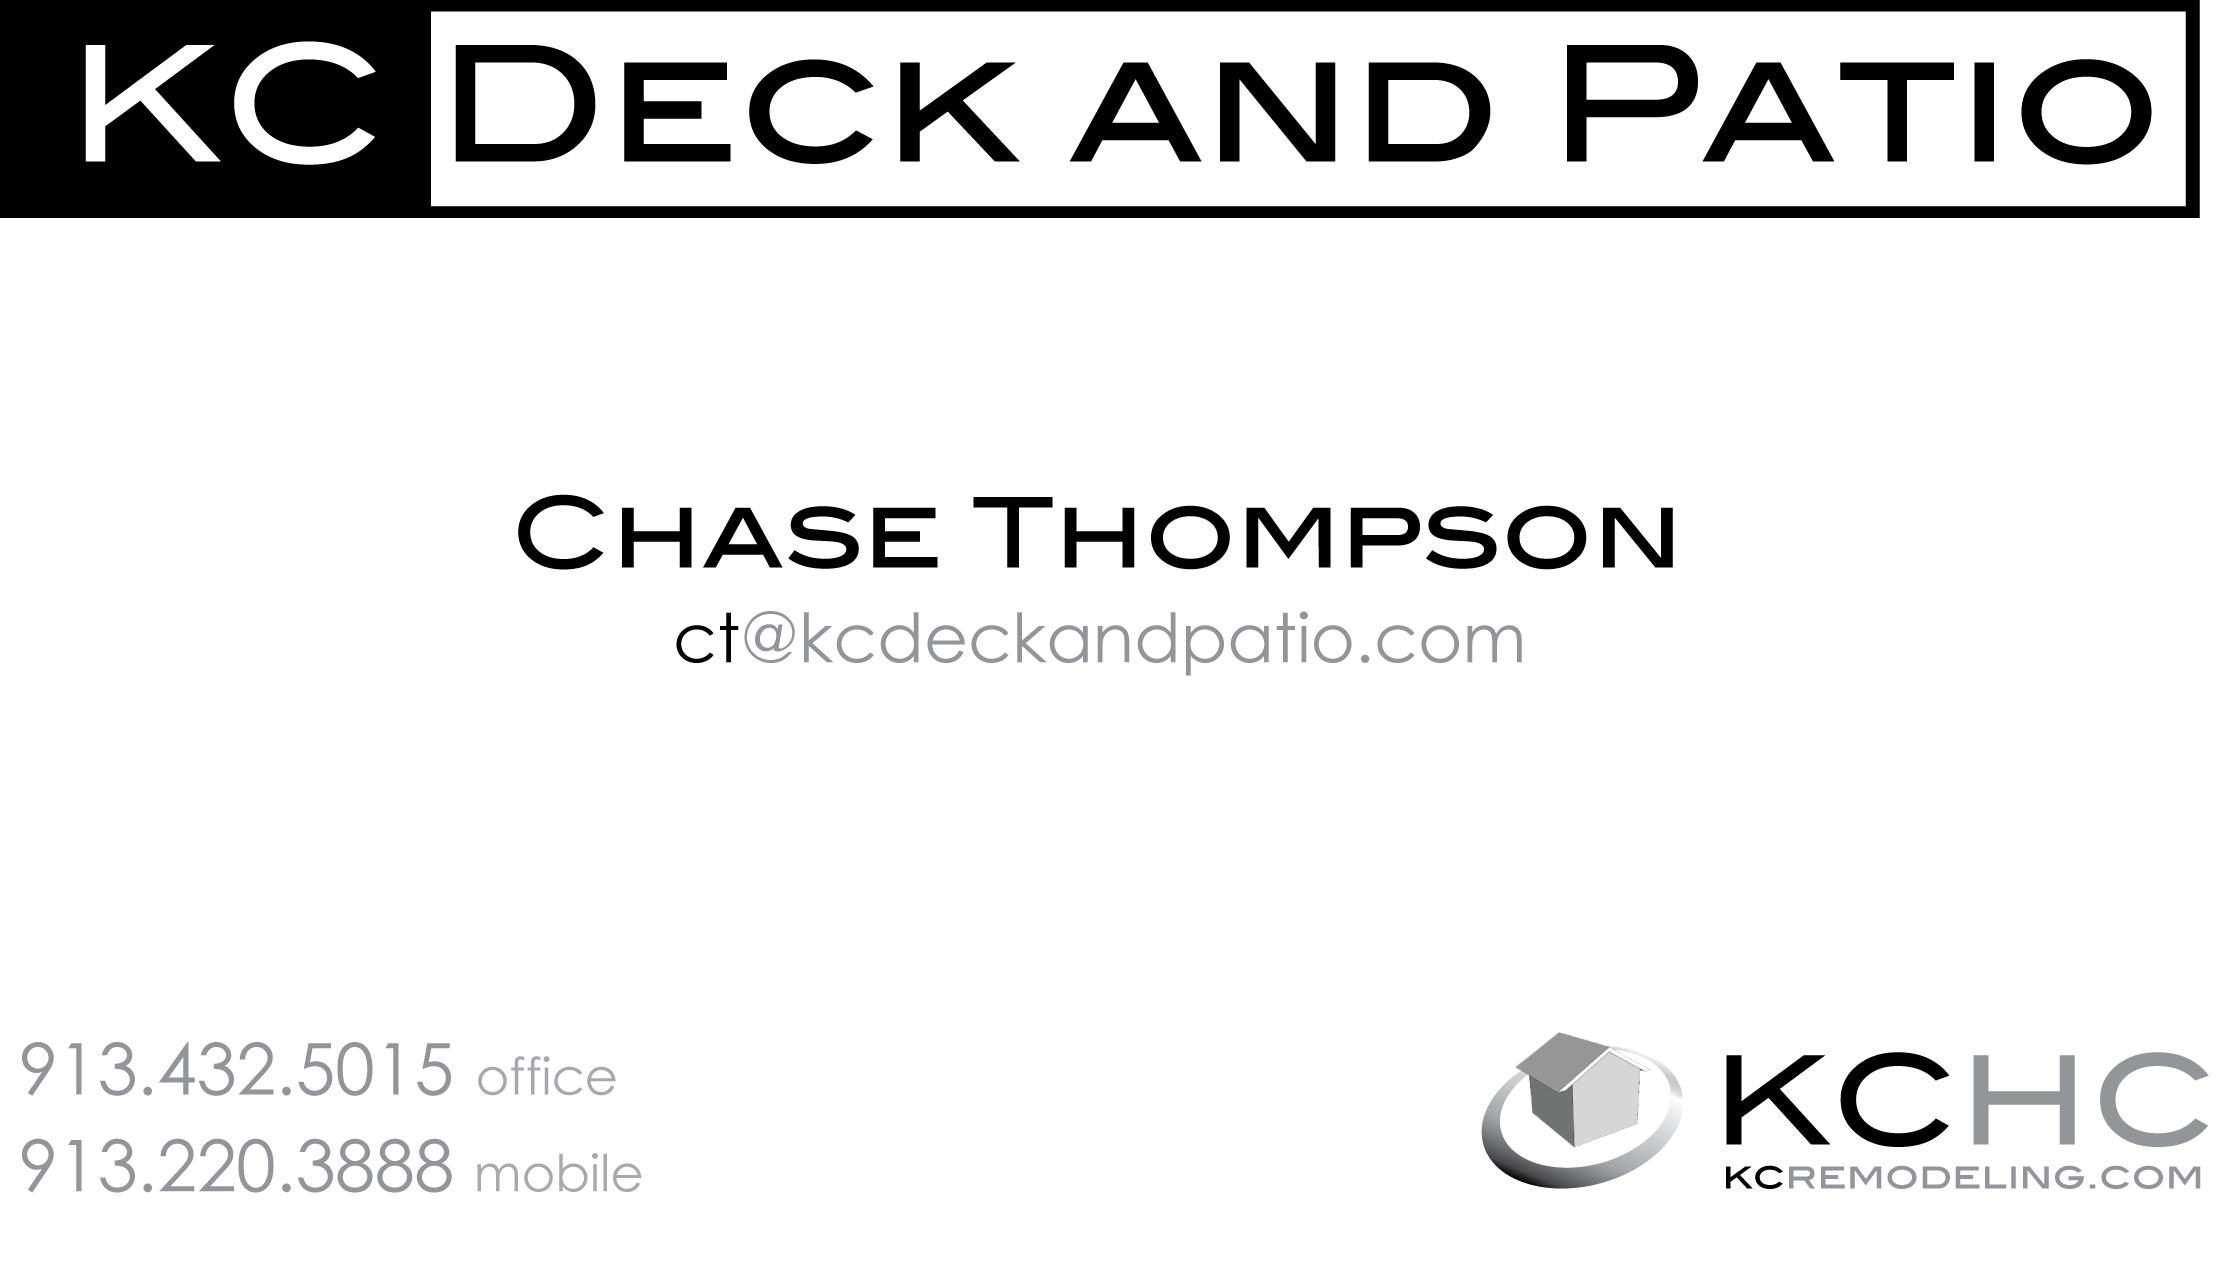 Handyman Business Card Templates | Business Card Sample